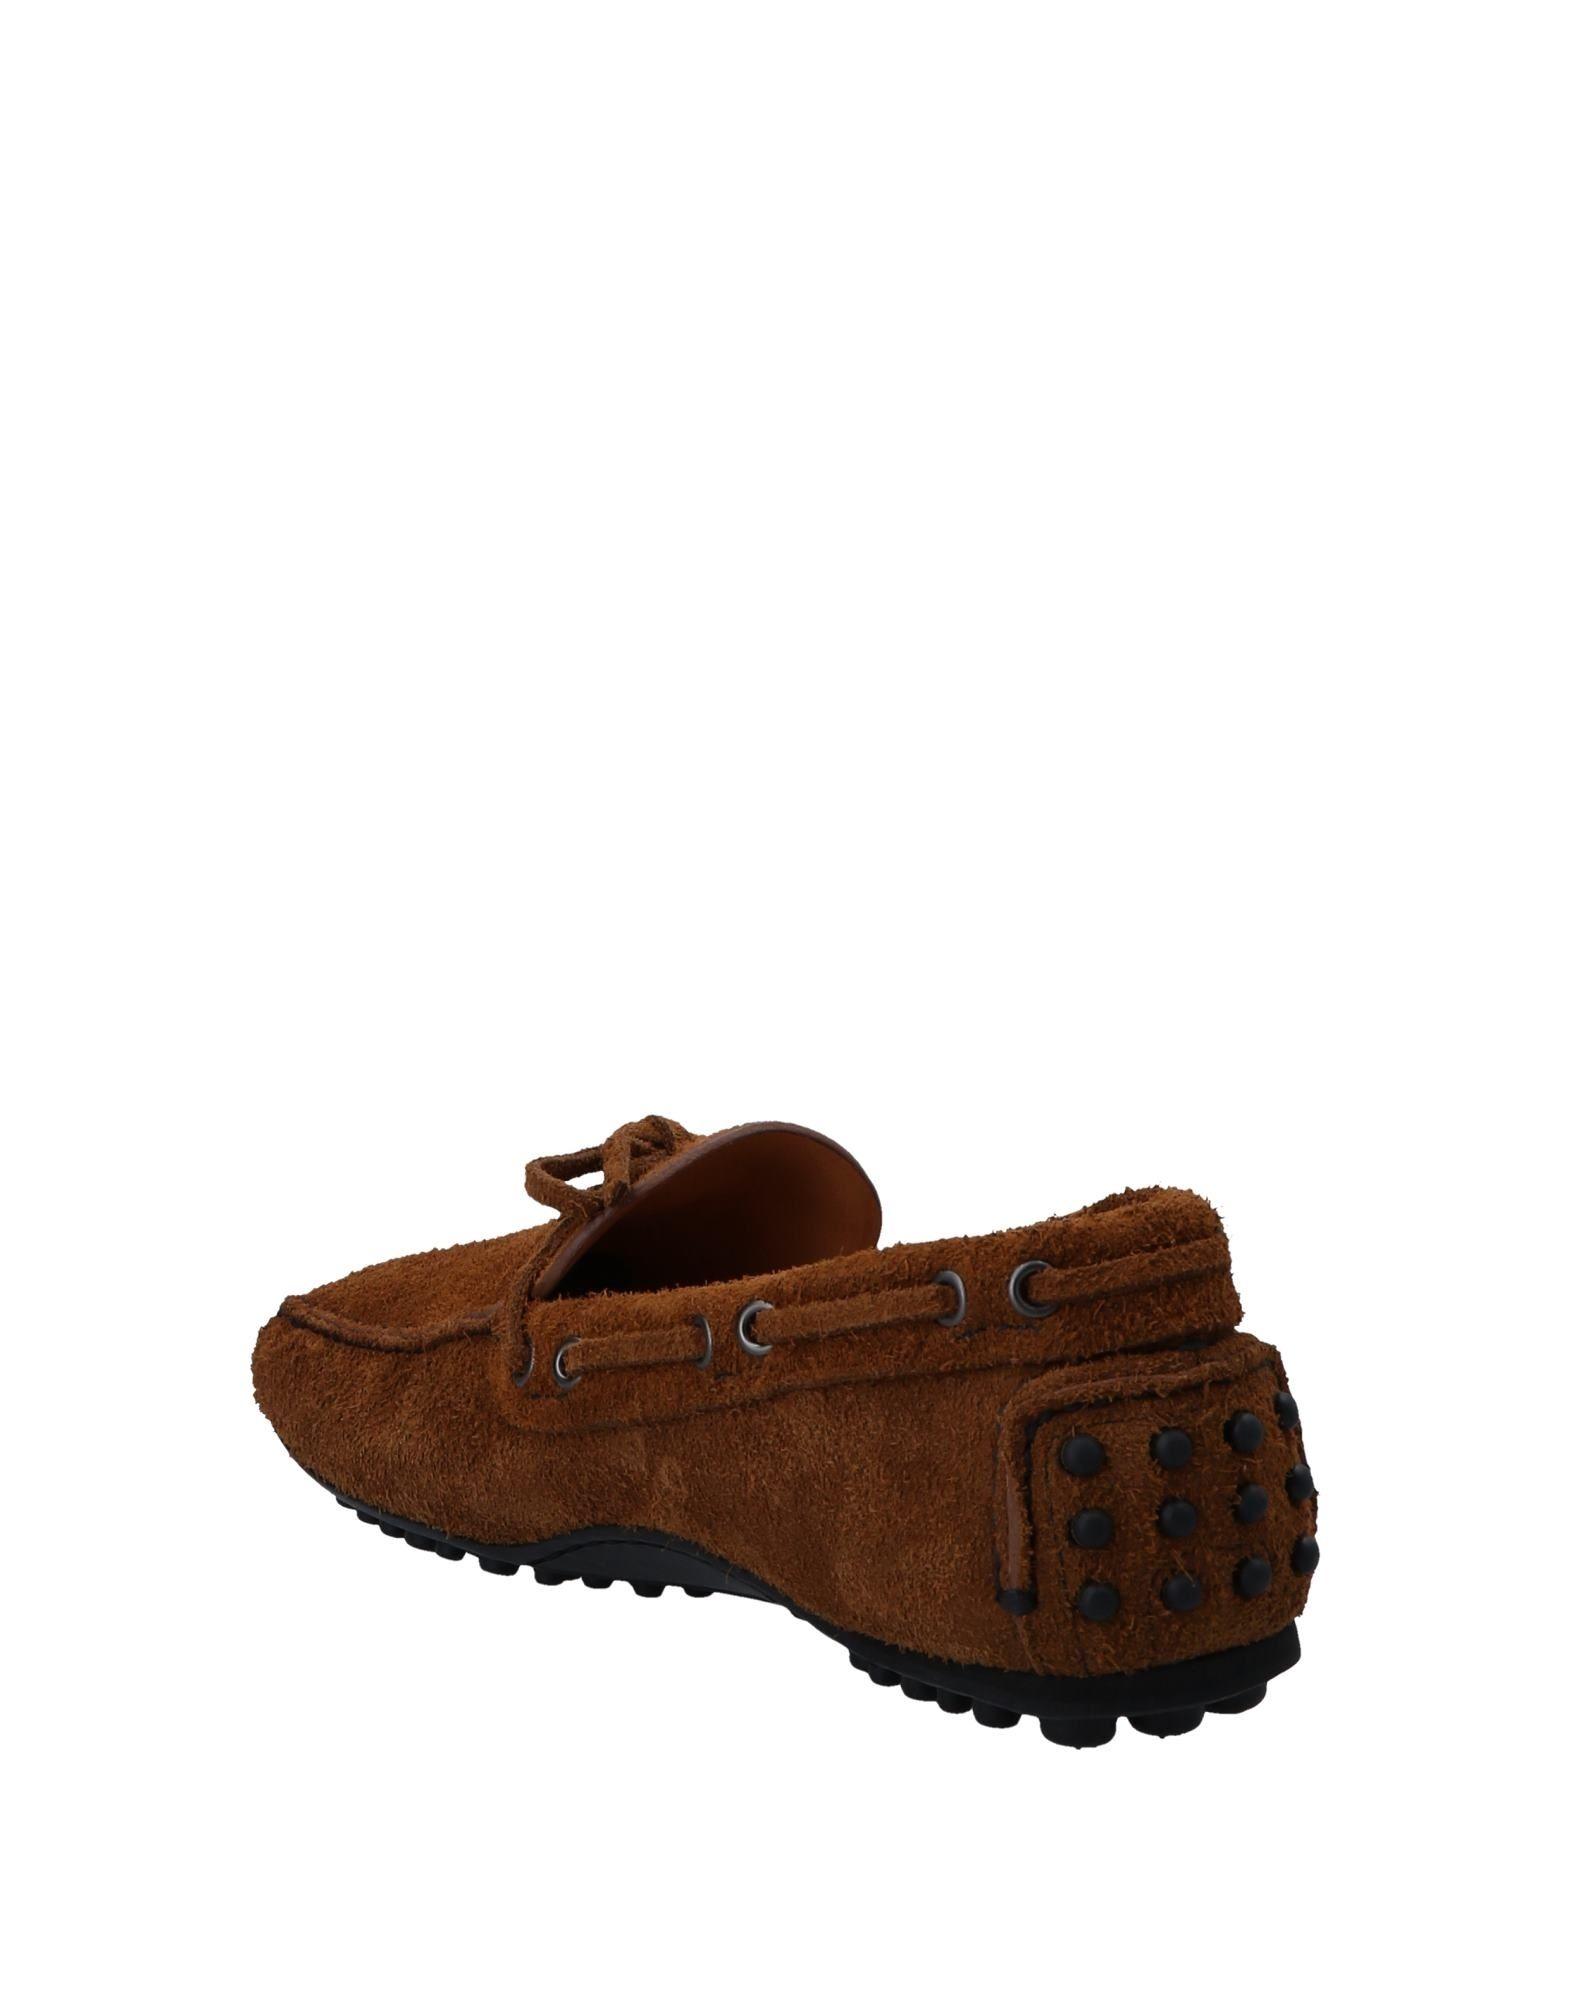 Carshoe Gute Mokassins Herren  11550184AK Gute Carshoe Qualität beliebte Schuhe c461bf